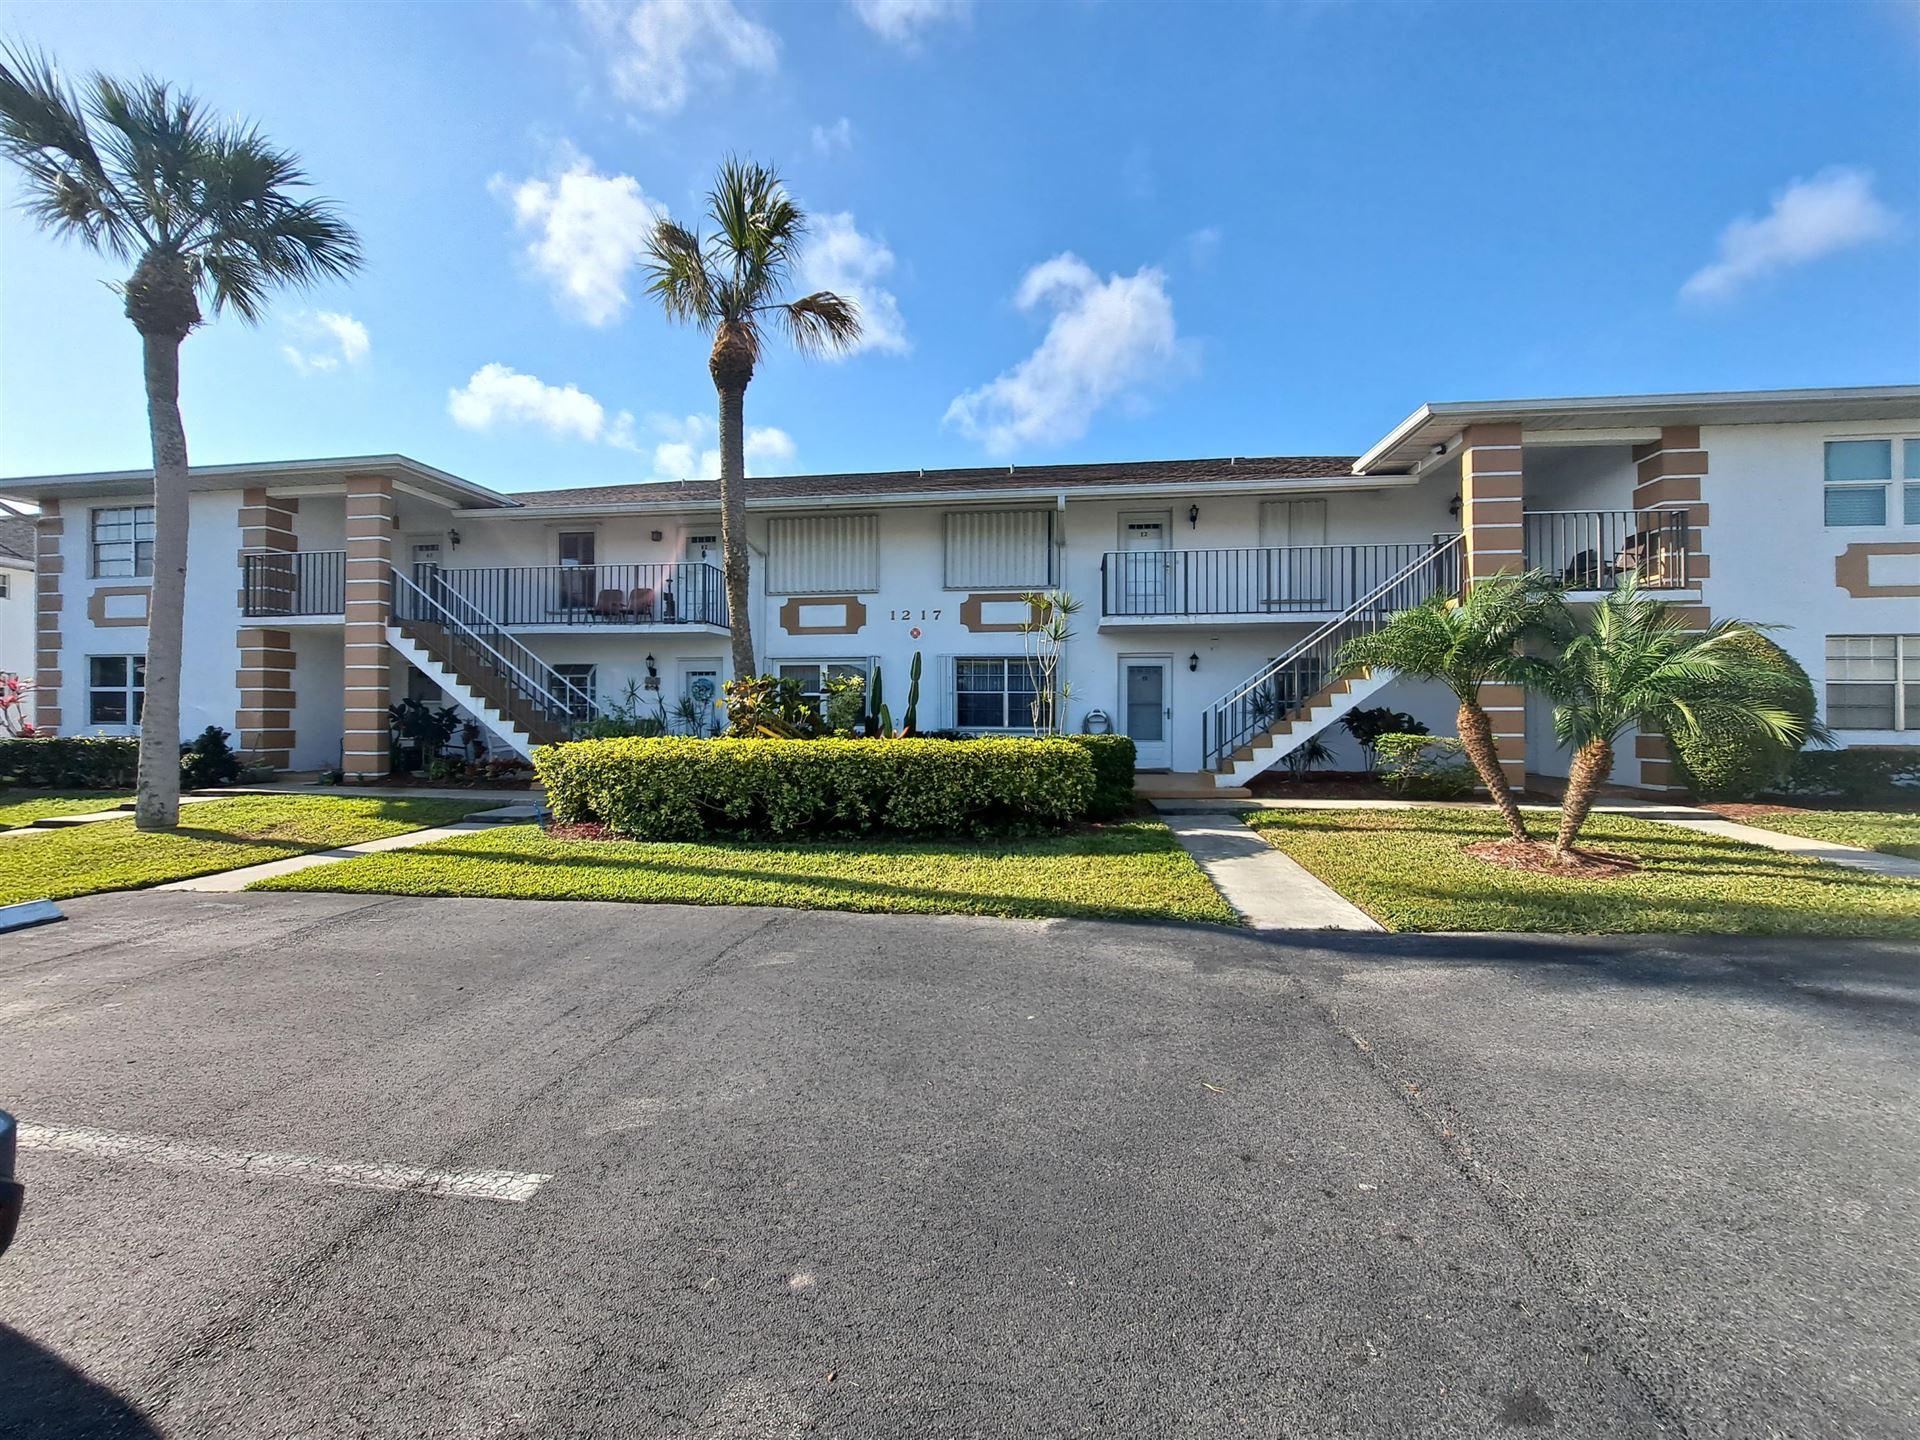 Photo of 1217 S Lakes End Drive #E-1, Fort Pierce, FL 34982 (MLS # RX-10704387)